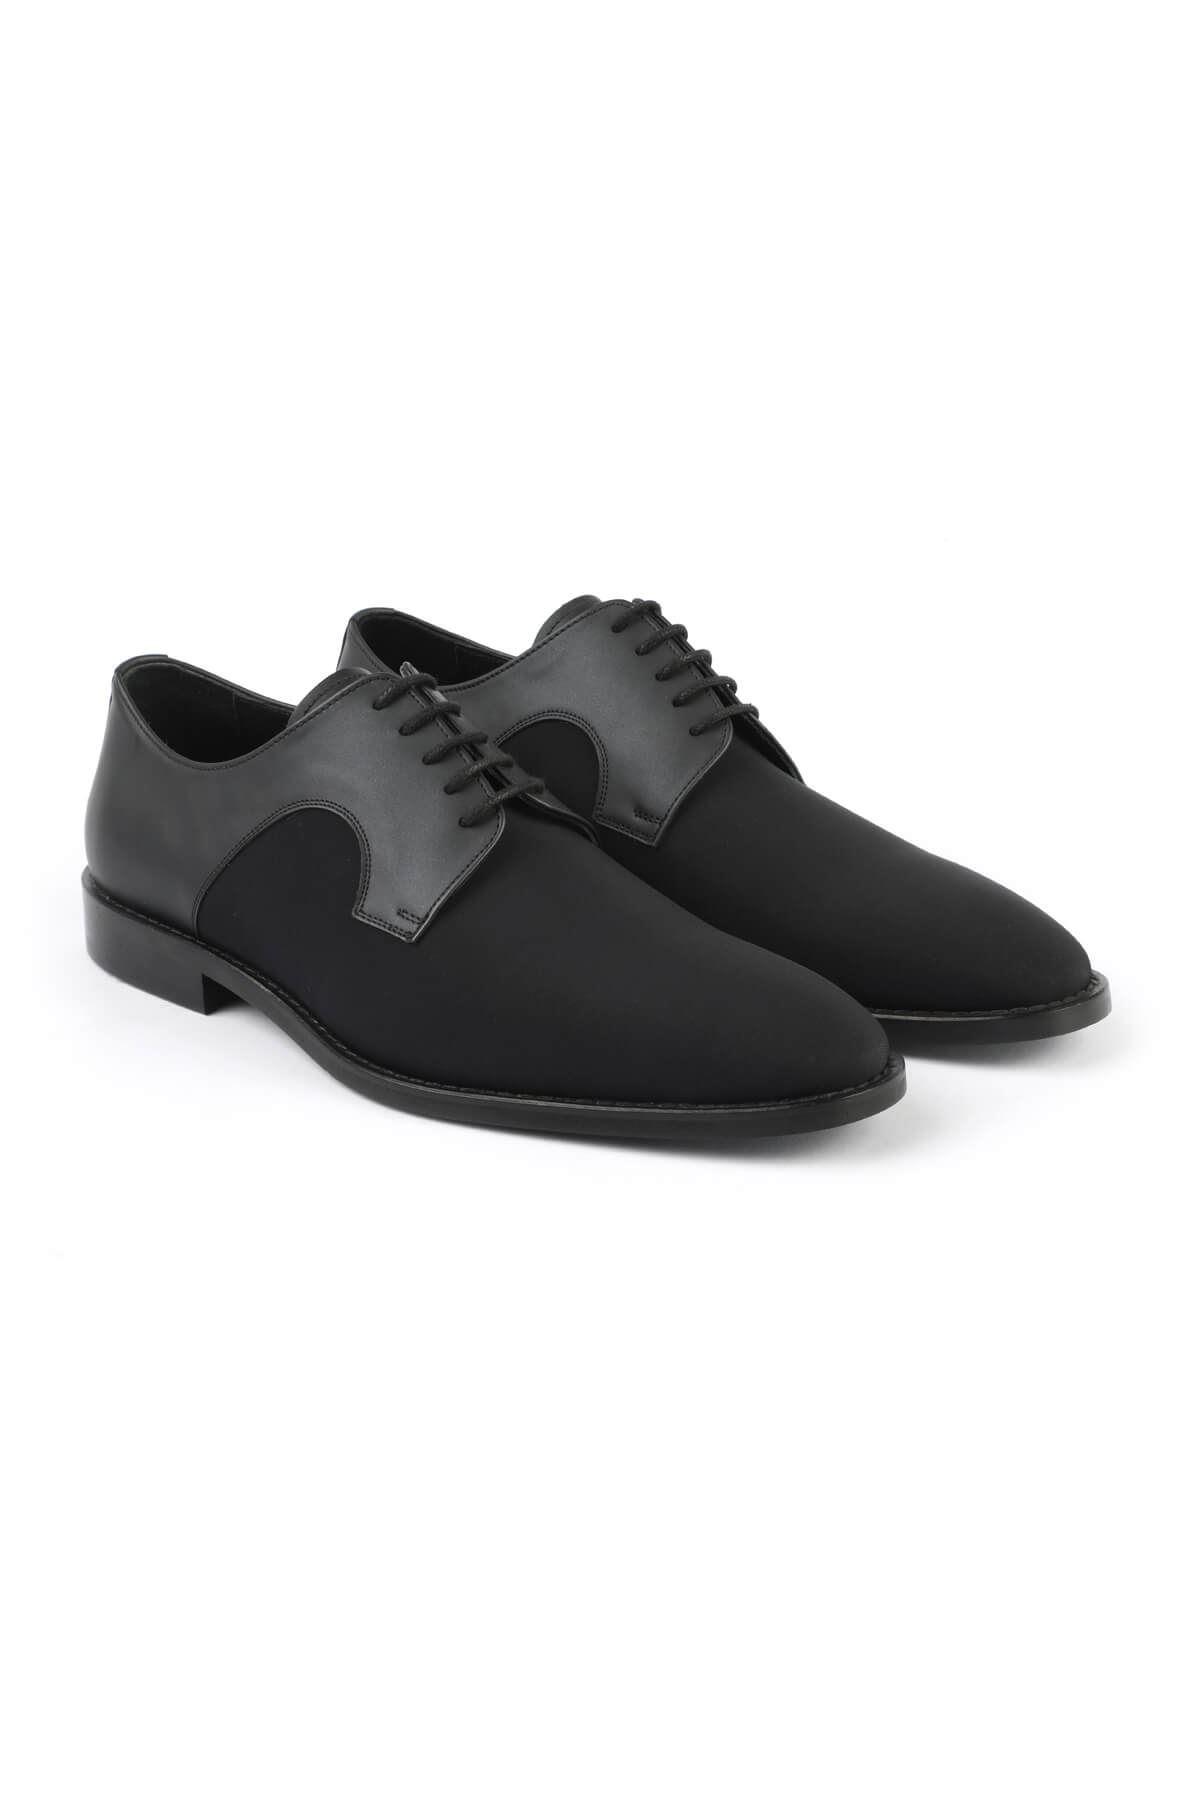 Libero 2727 Black Classic Shoes